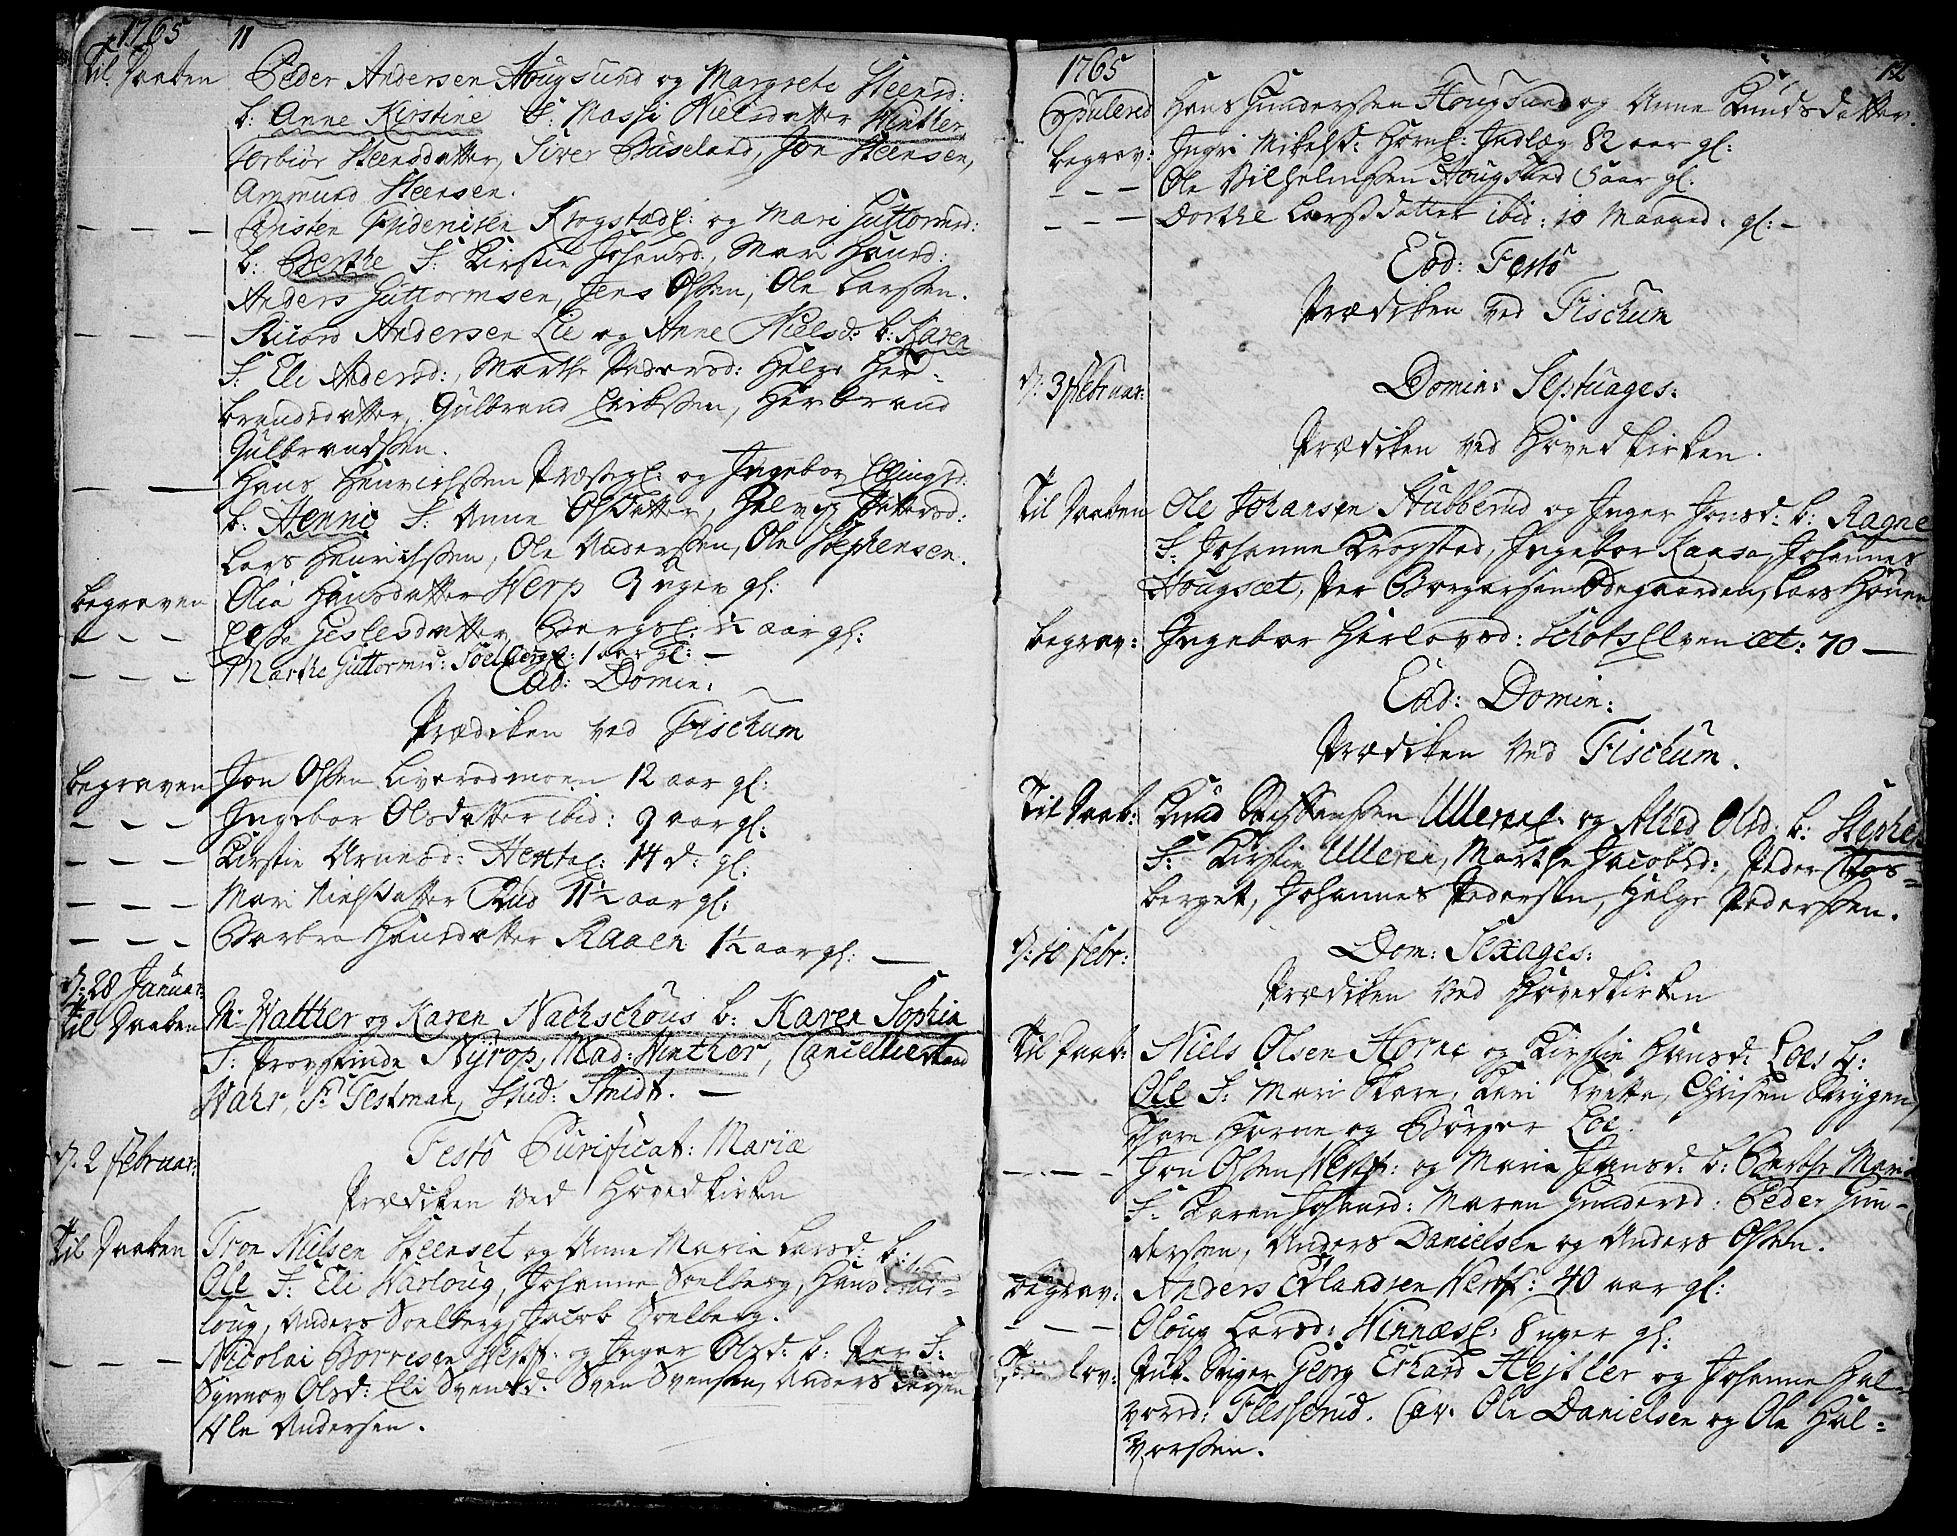 SAKO, Eiker kirkebøker, F/Fa/L0008: Ministerialbok nr. I 8, 1764-1788, s. 11-12